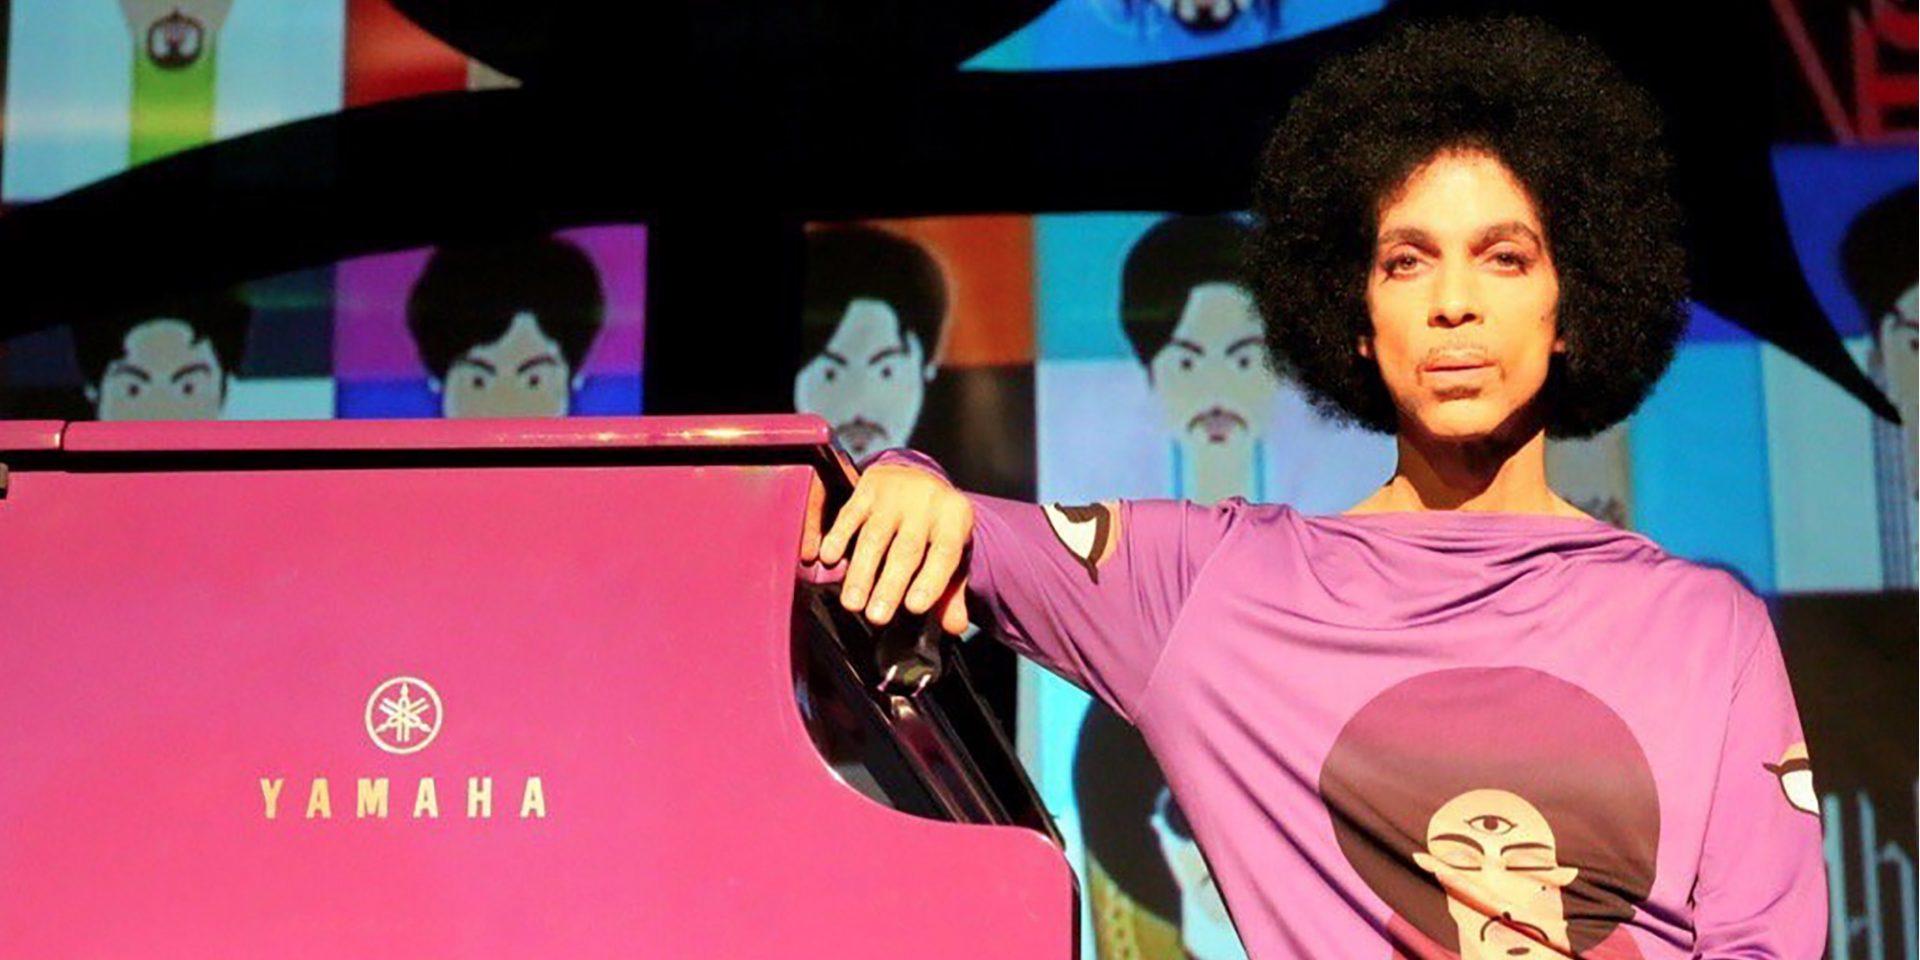 Prince-biographie